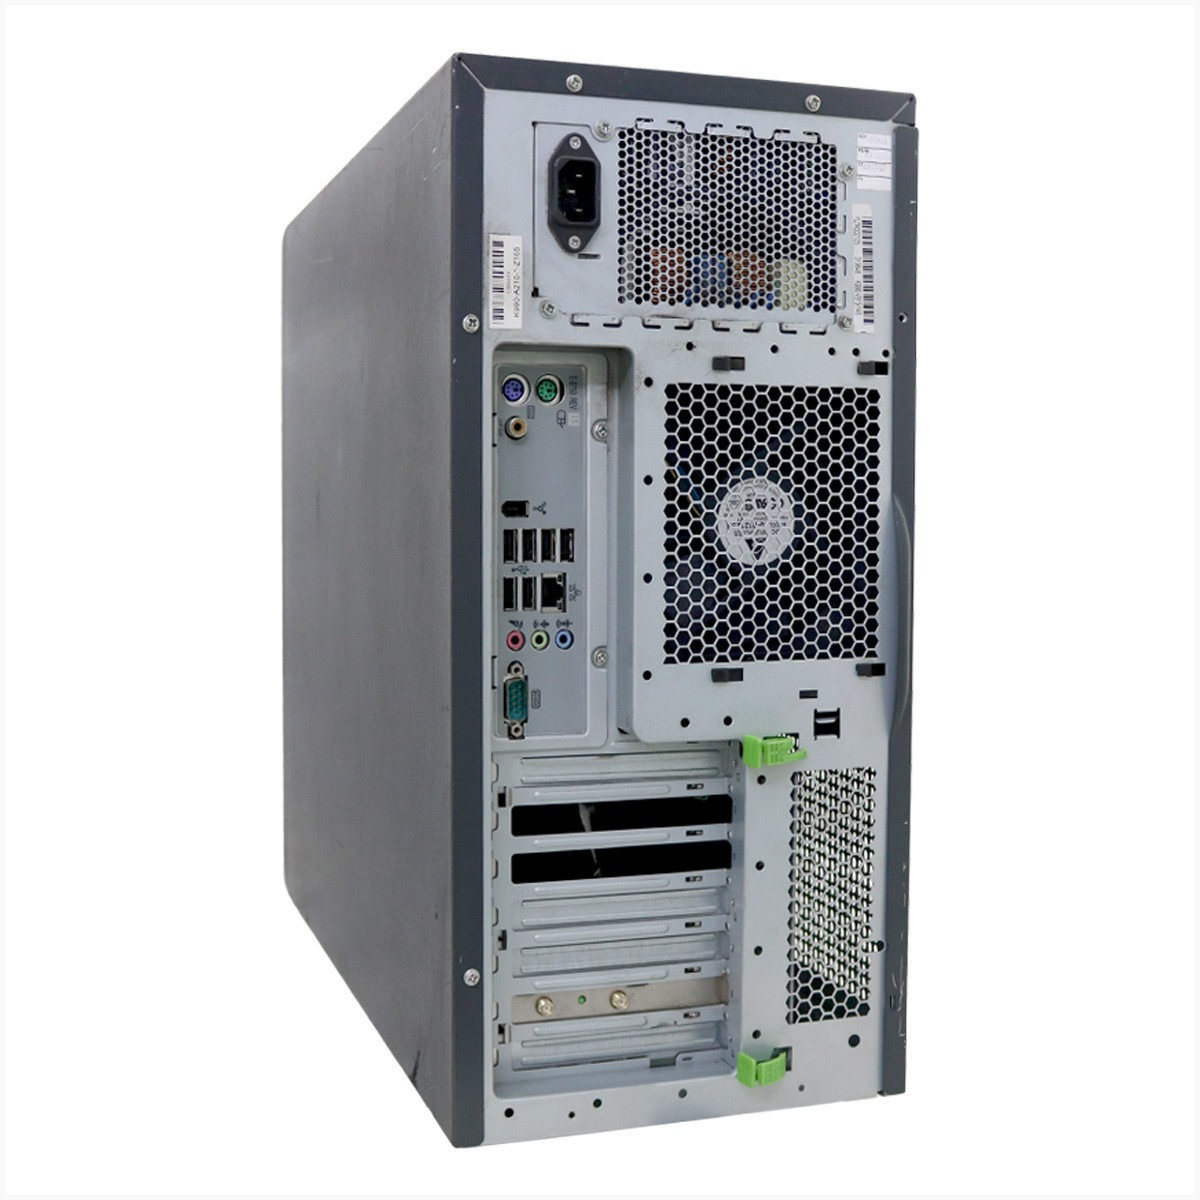 Workstation fujitsu celsius m470-2 xeon w3520 16gb 480gb ssd - usado